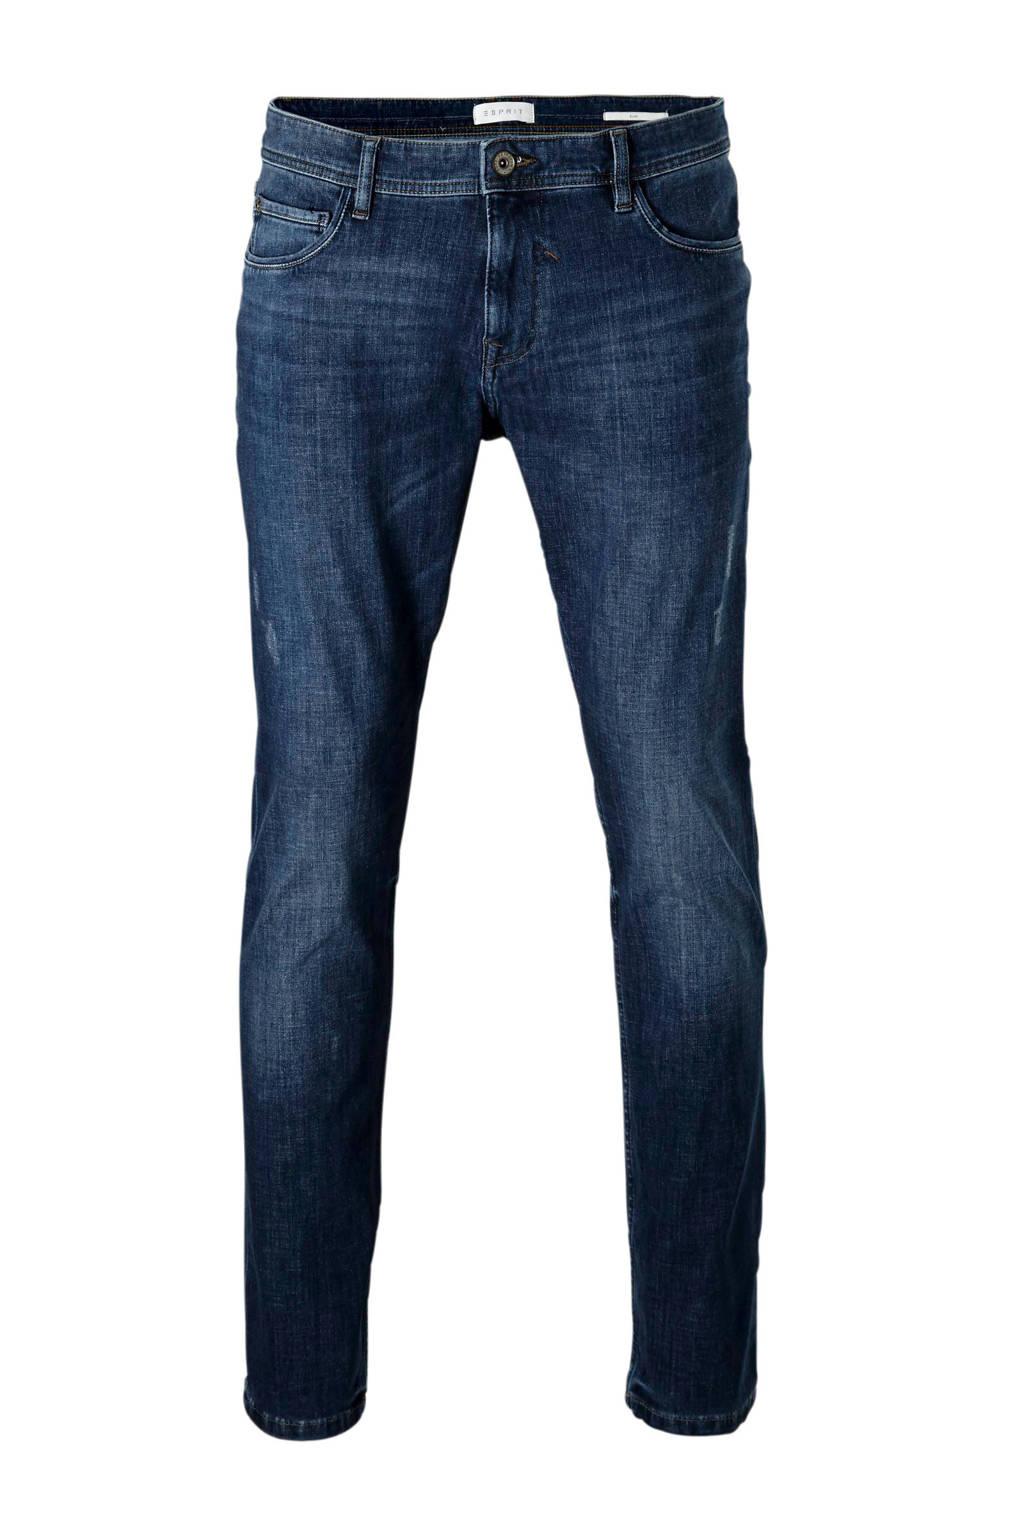 ESPRIT Men Casual  slim slim fit jeans, Donkerblauw